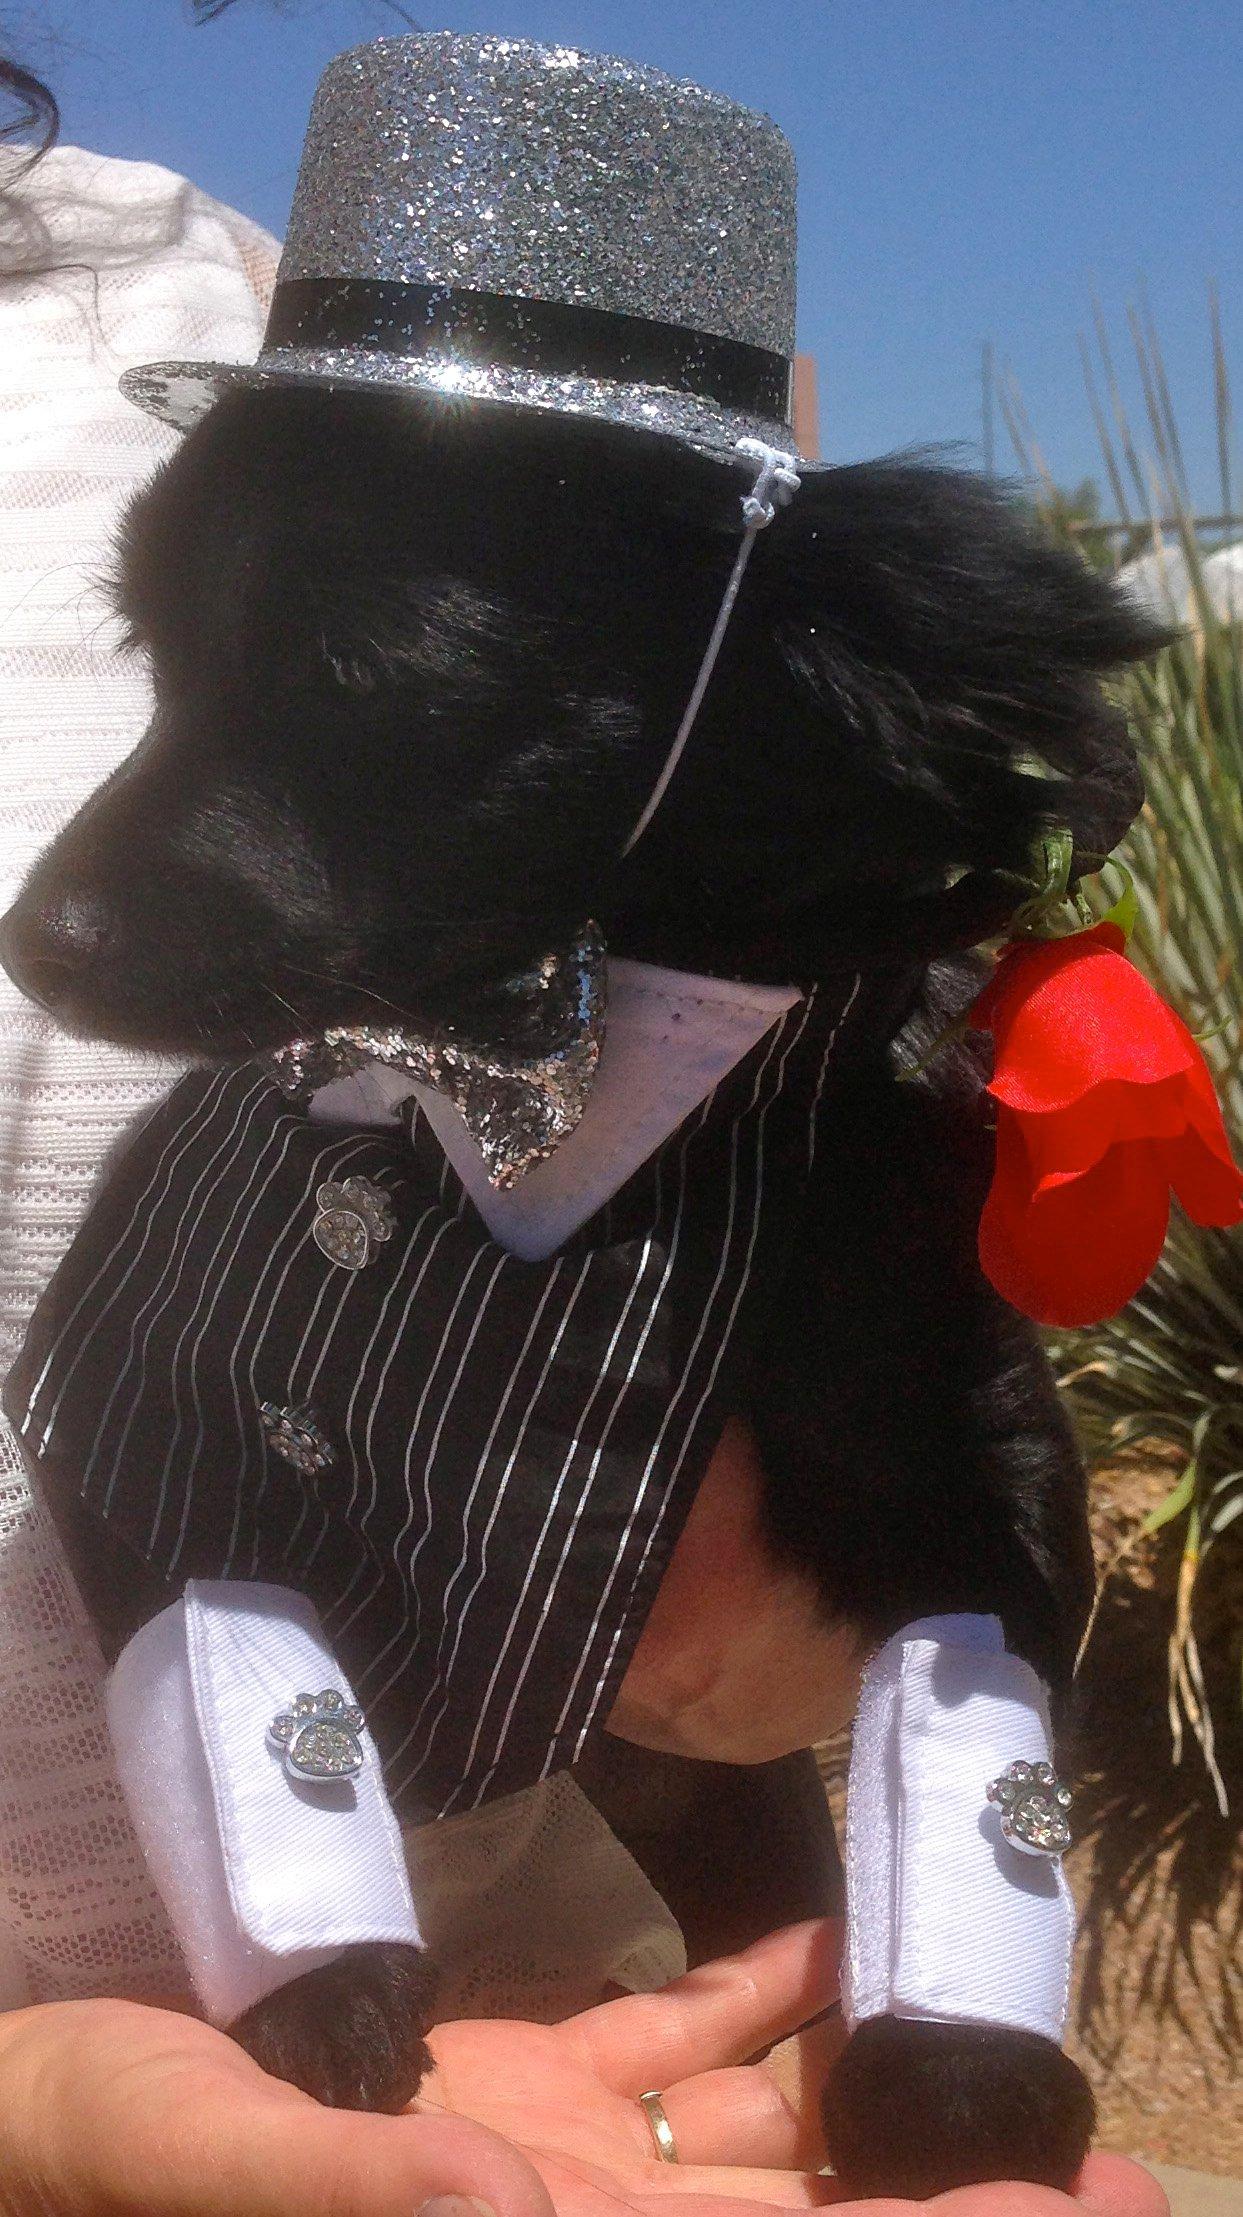 Joyce's dog, Max II, won the race (Source: Joyce)